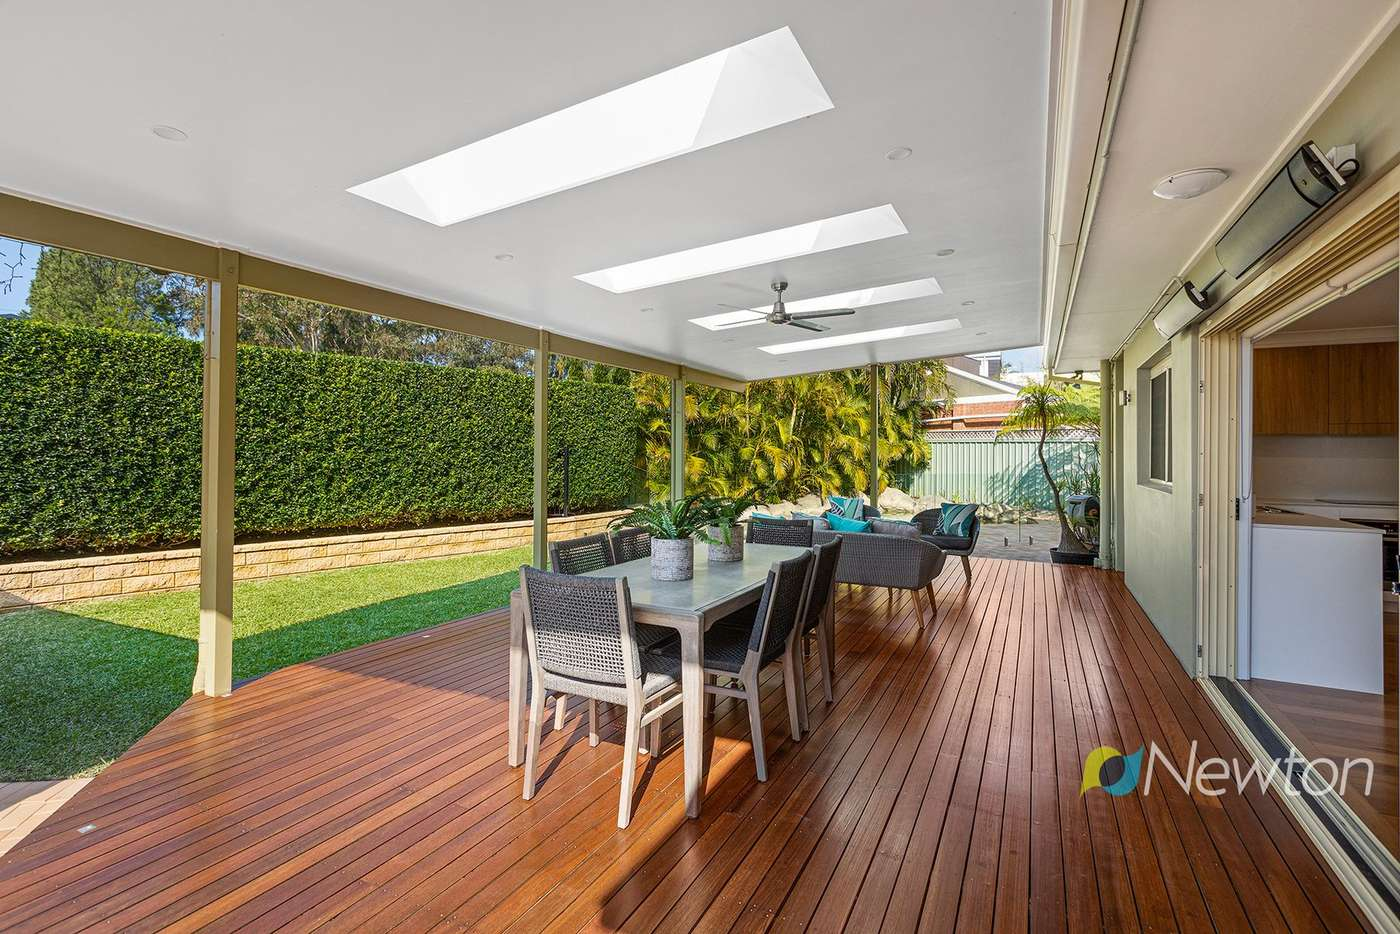 Main view of Homely house listing, 3 Nyngan Place, Miranda NSW 2228